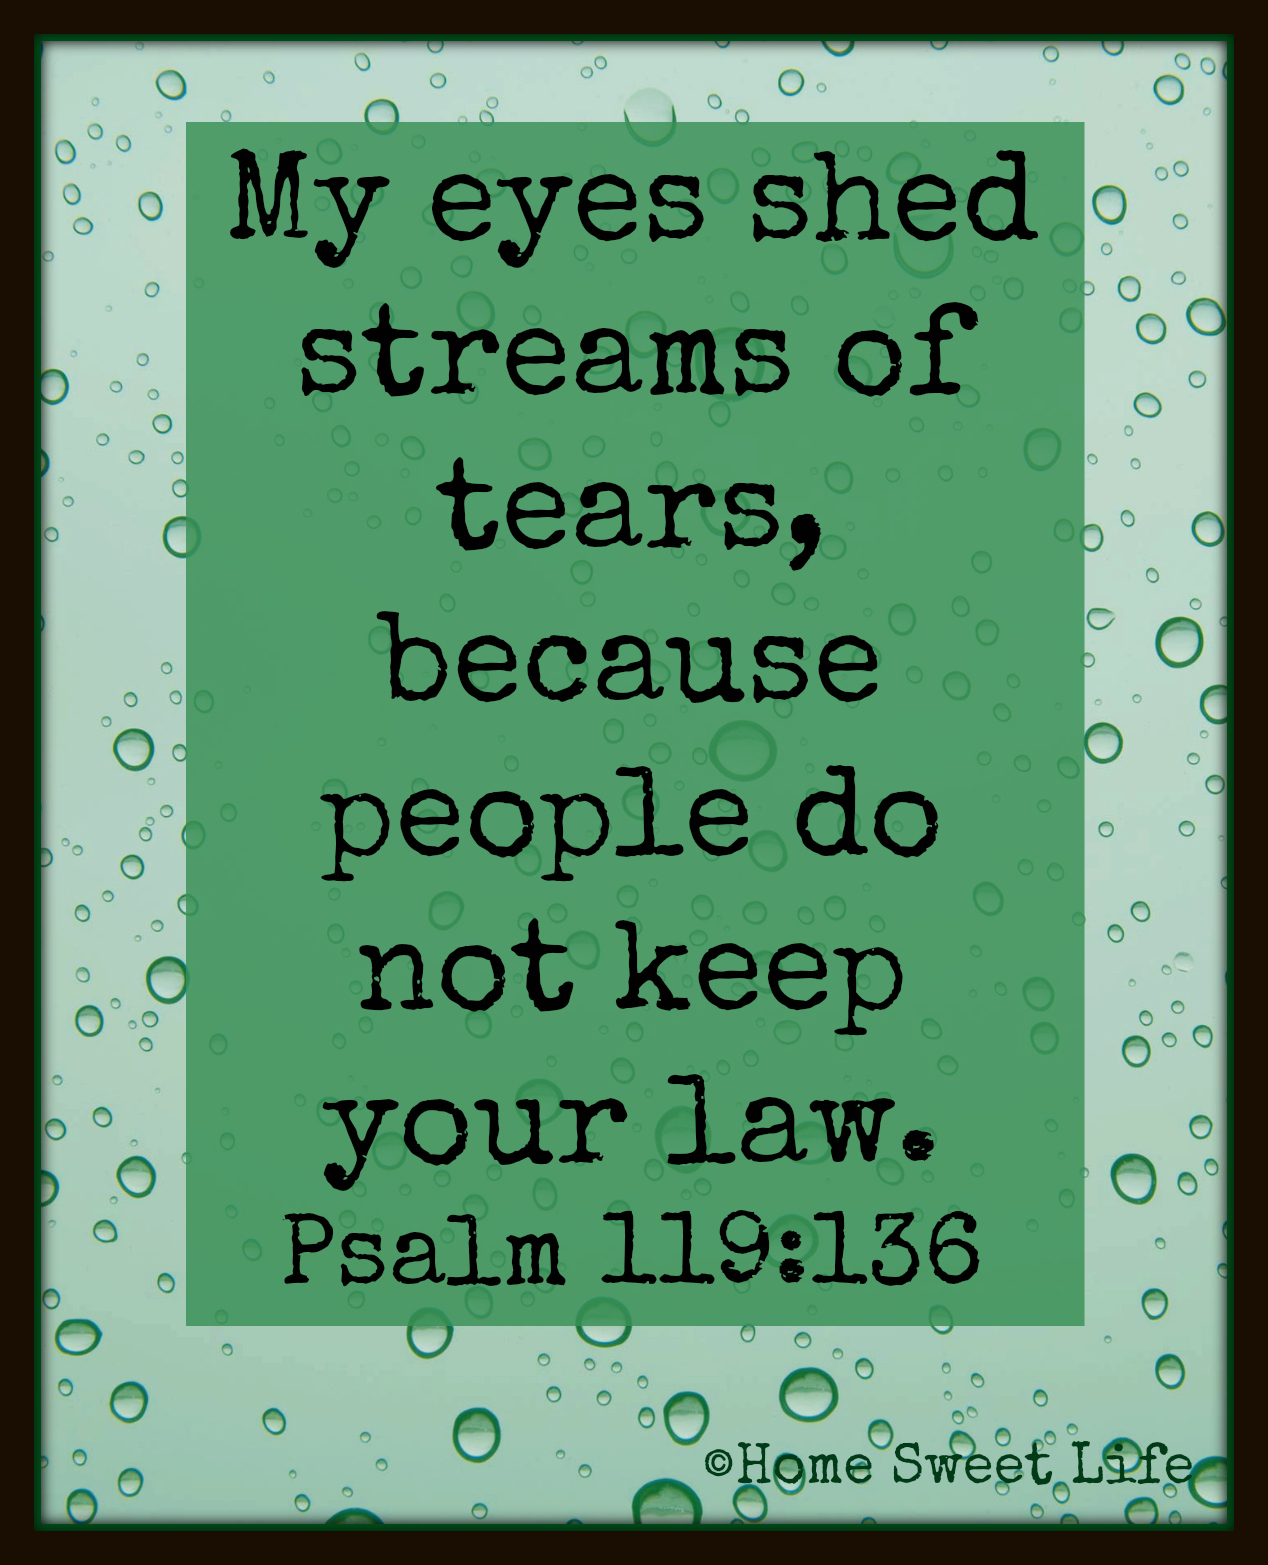 Psalm 119:136